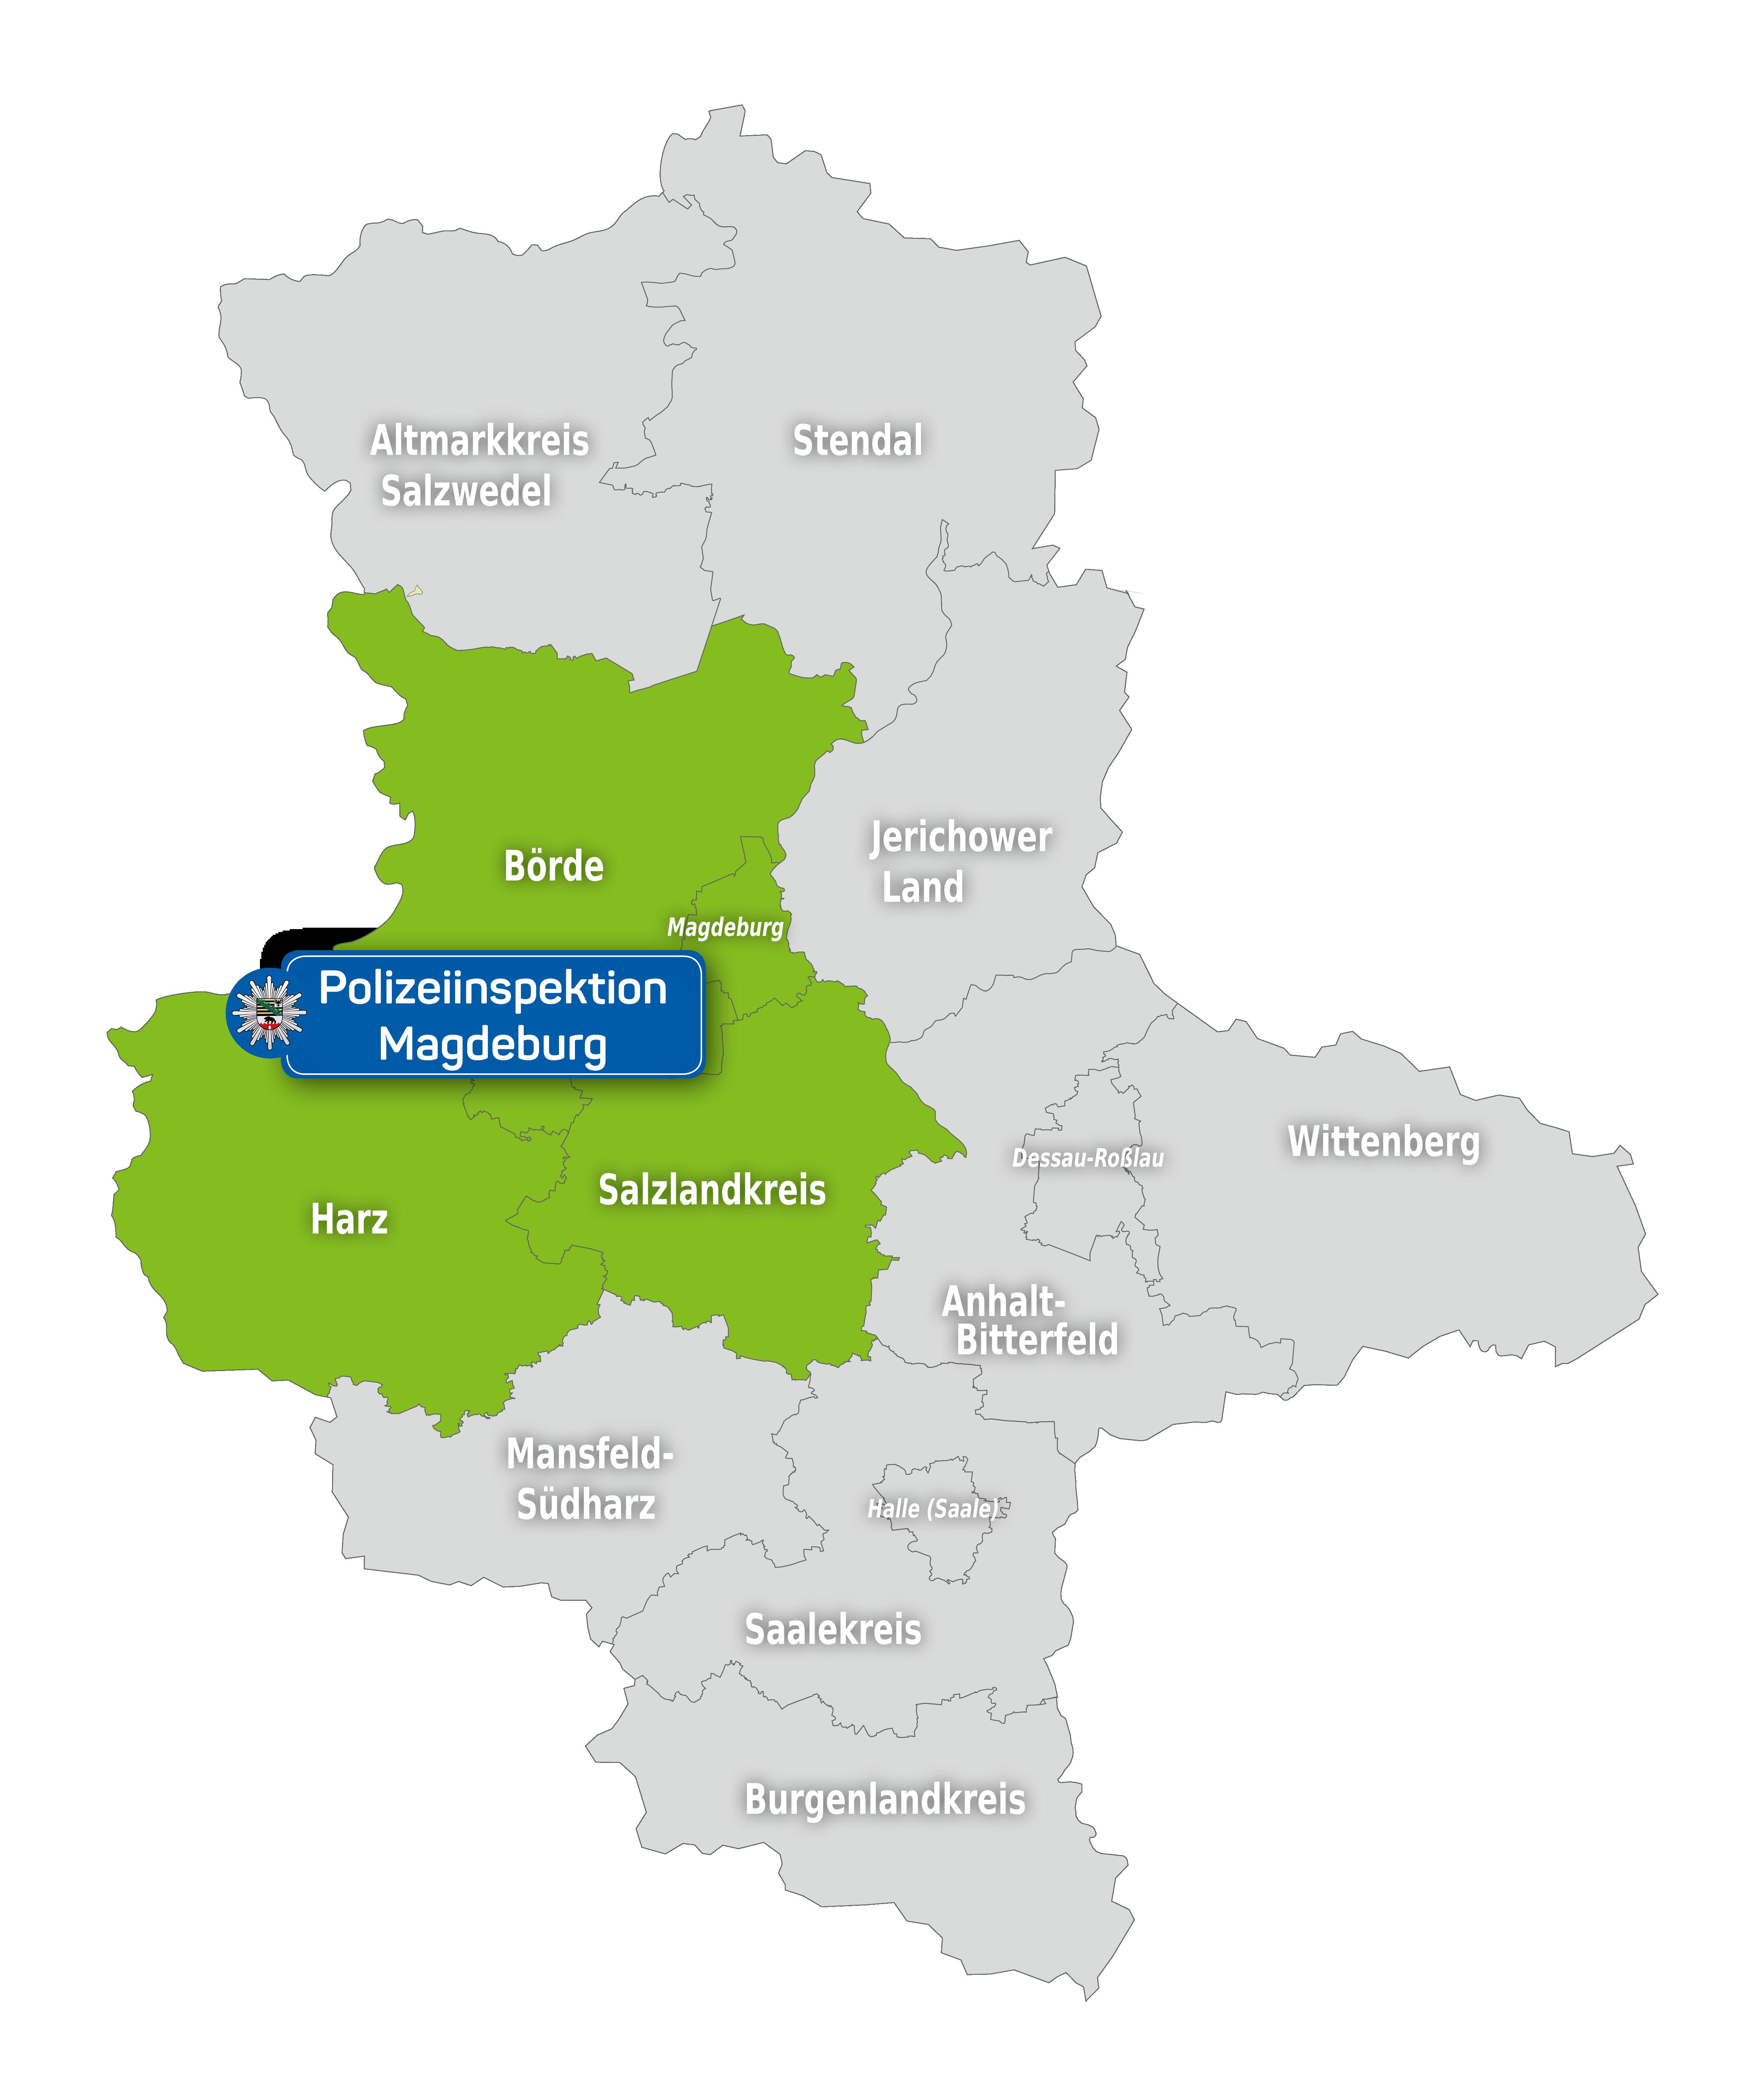 PI Magdeburg